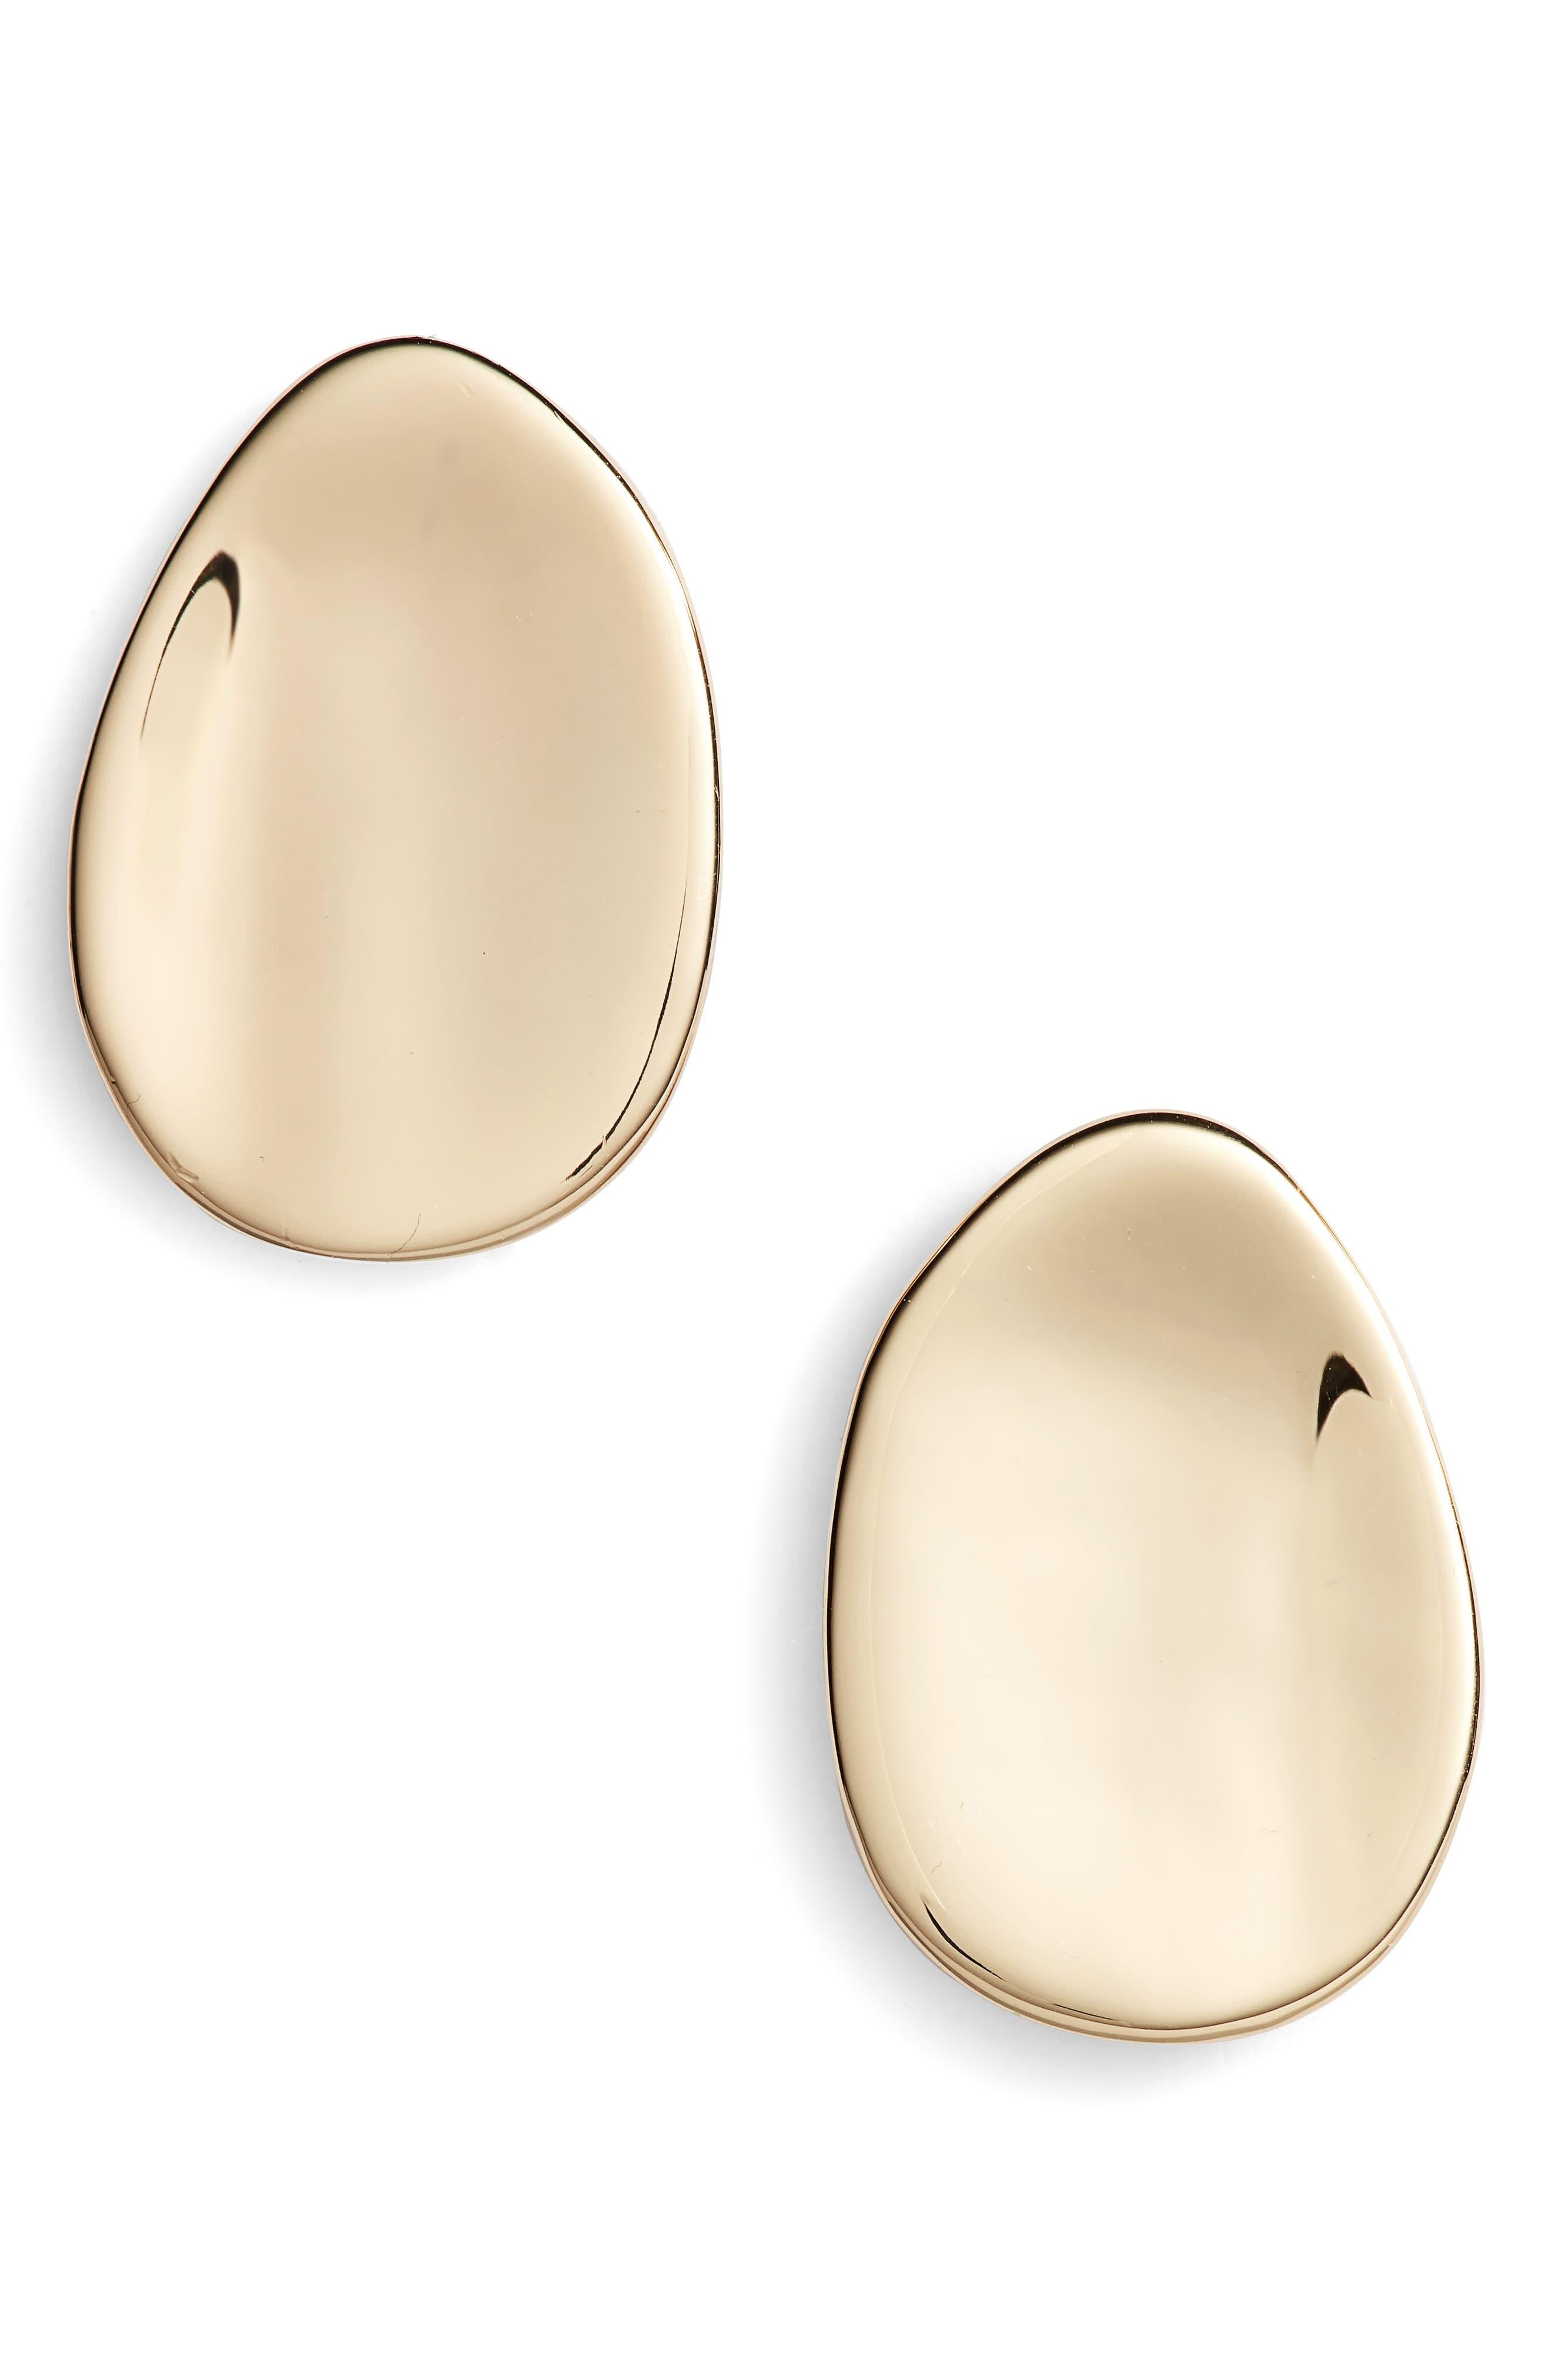 Dish Stud Earrings,                             Main thumbnail 1, color,                             Gold